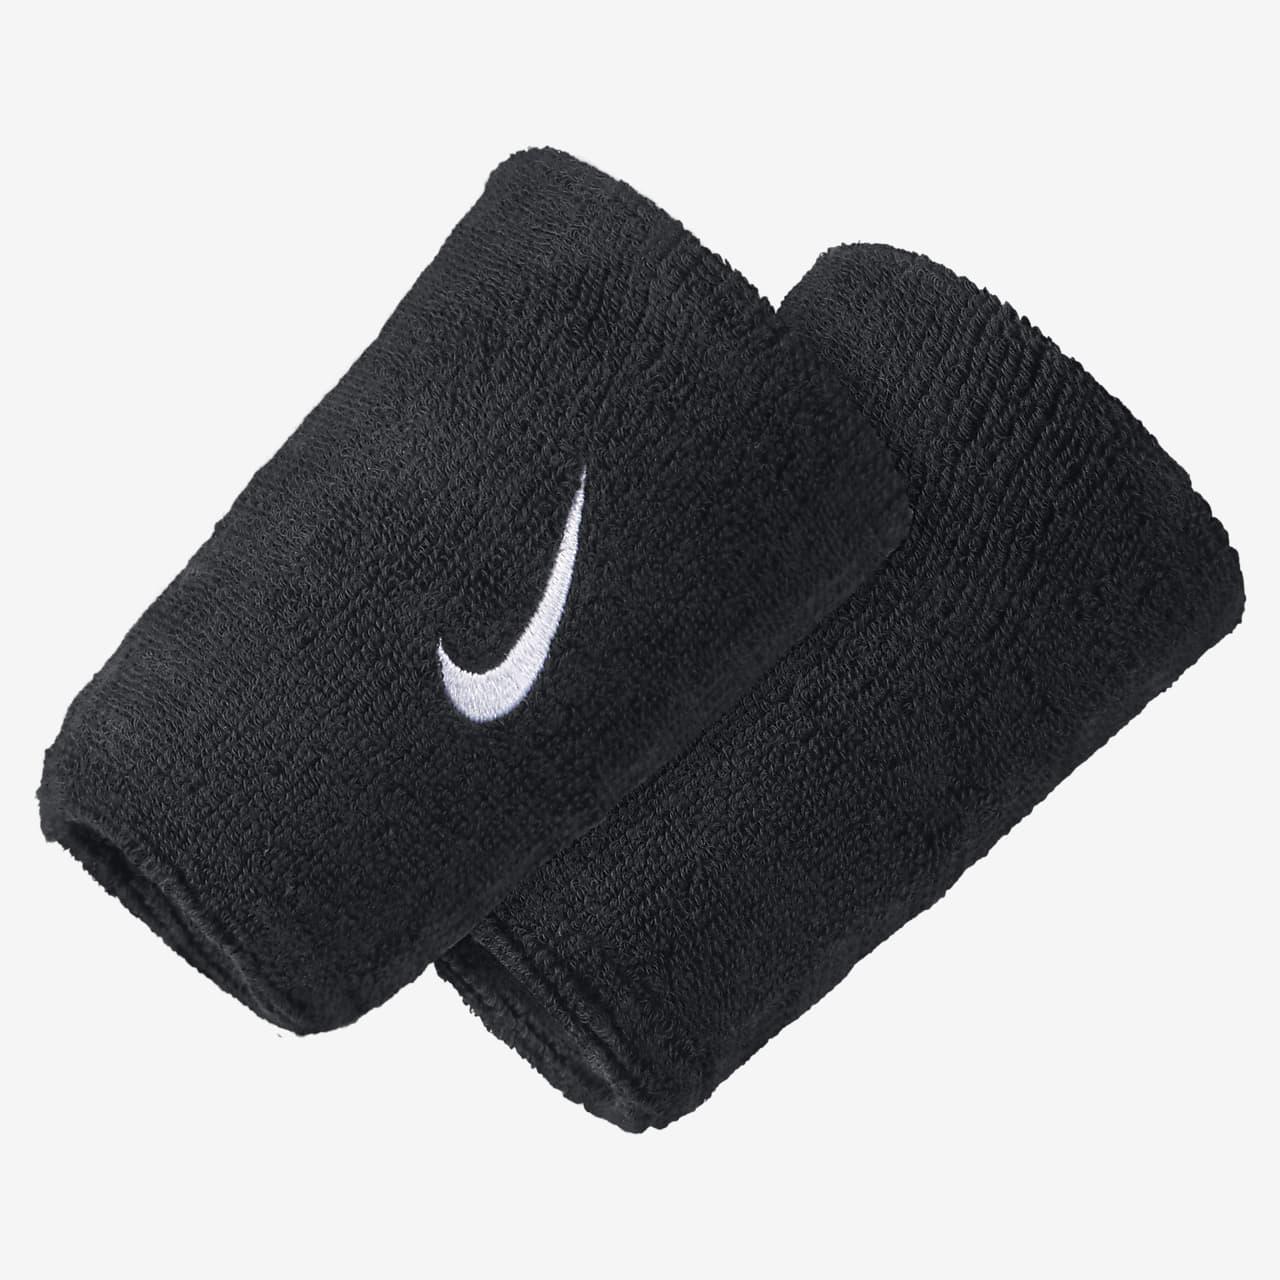 Nike Swoosh Extra-Wide Wristbands